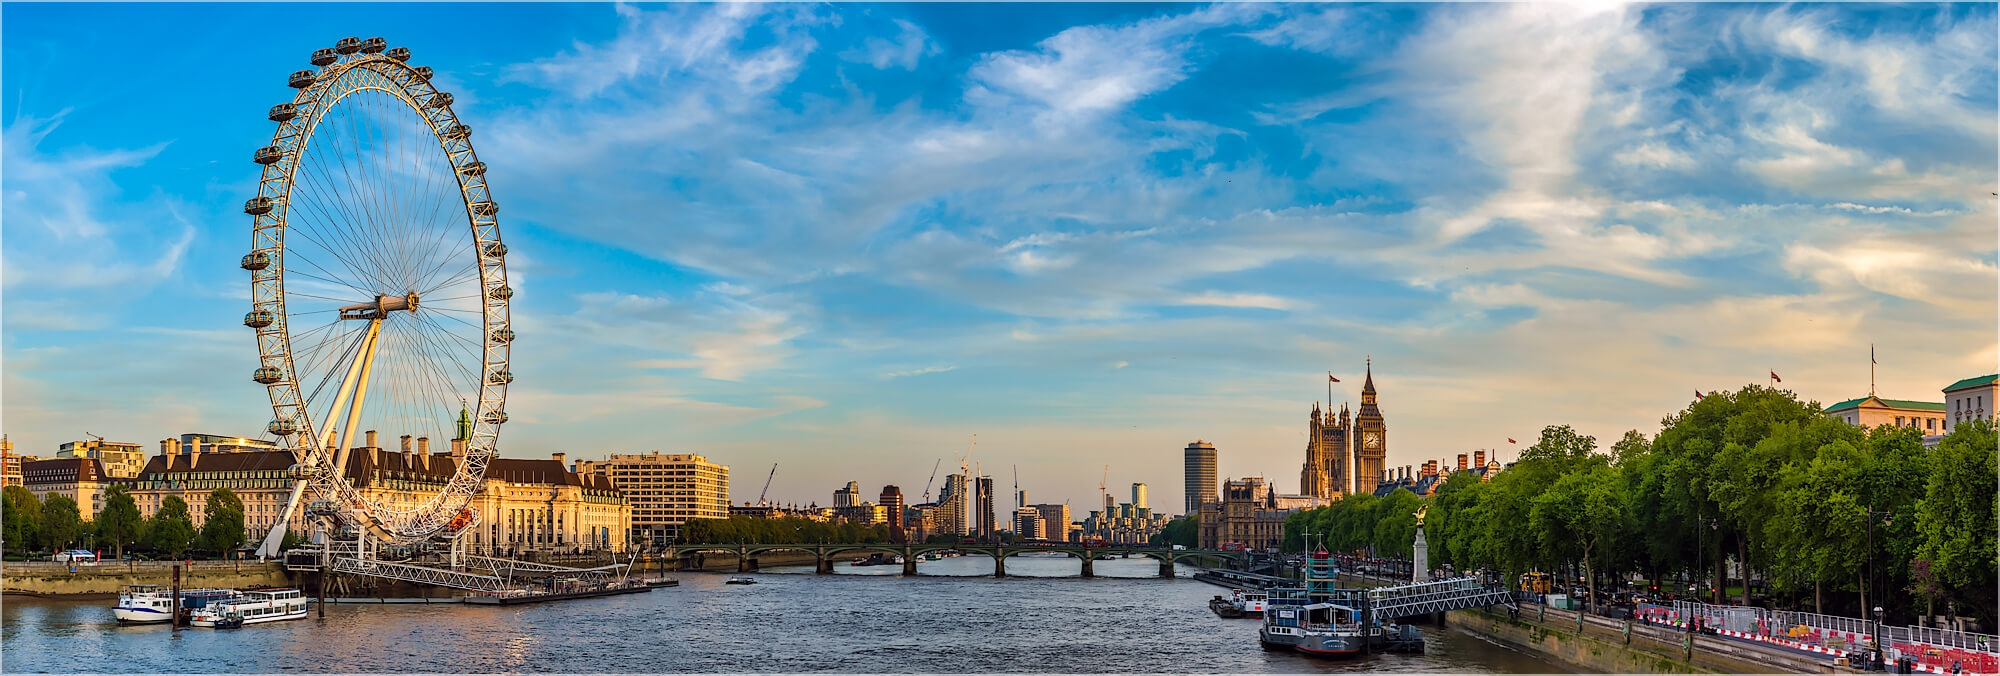 Panoramabild London Skyline Riesenrad und Parlament